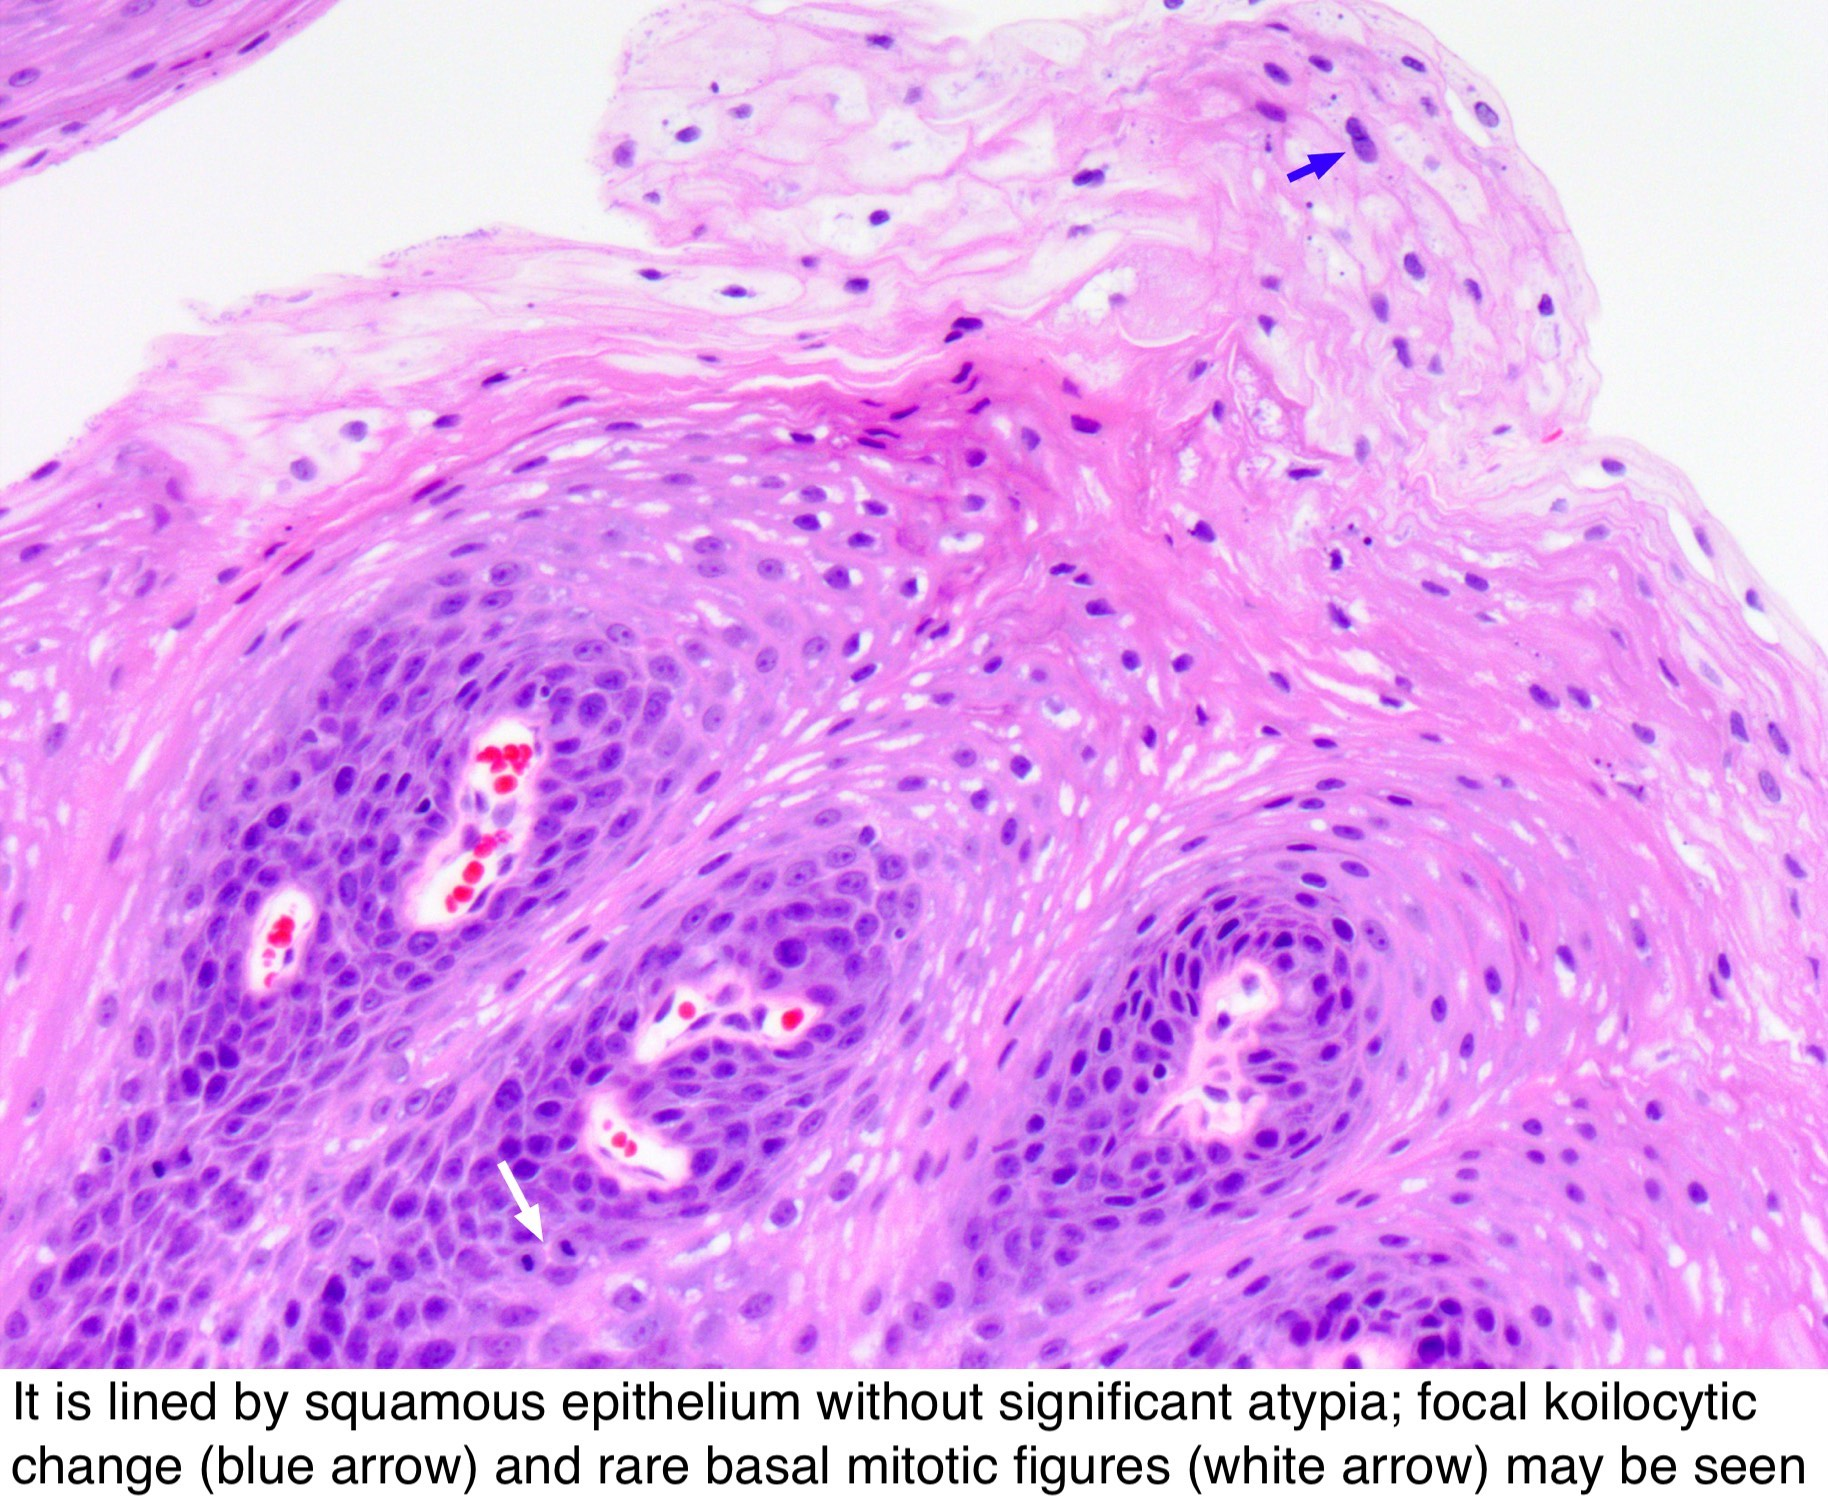 Nasal papilloma pathology, Maxilectomia maxilară medială pentru papilomul inversat